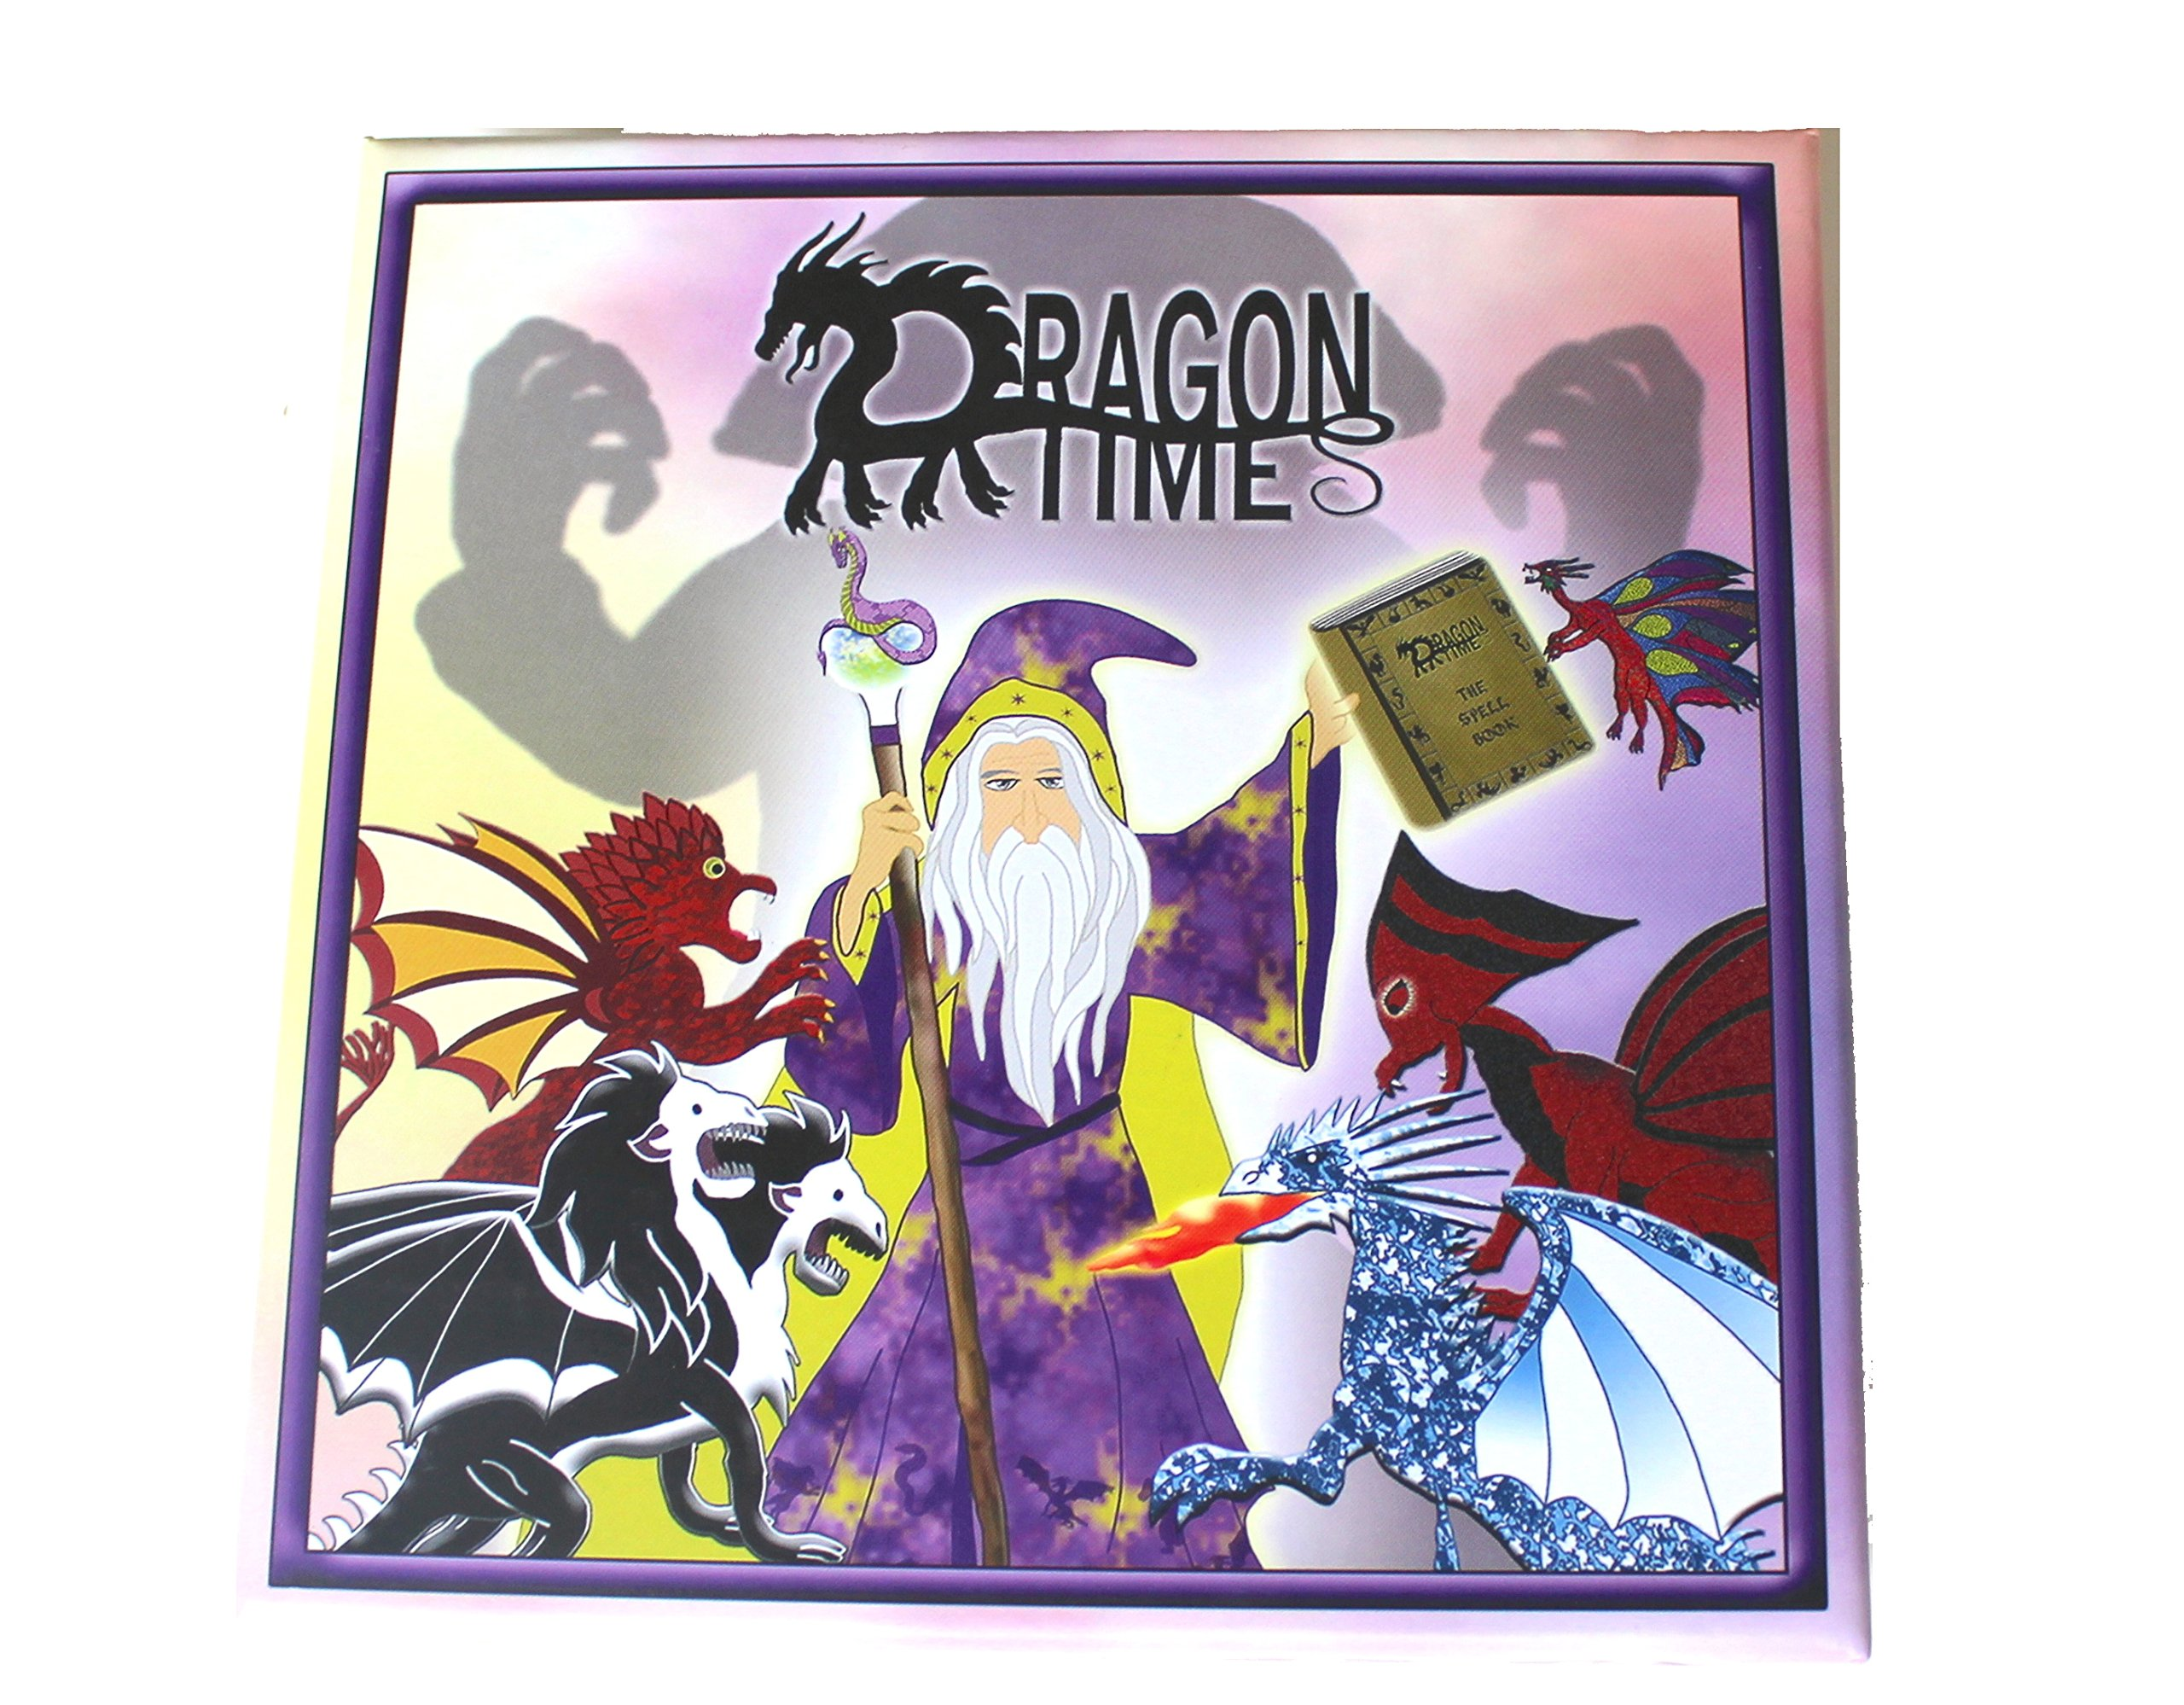 Dragon Times - A math adventure card game for kids